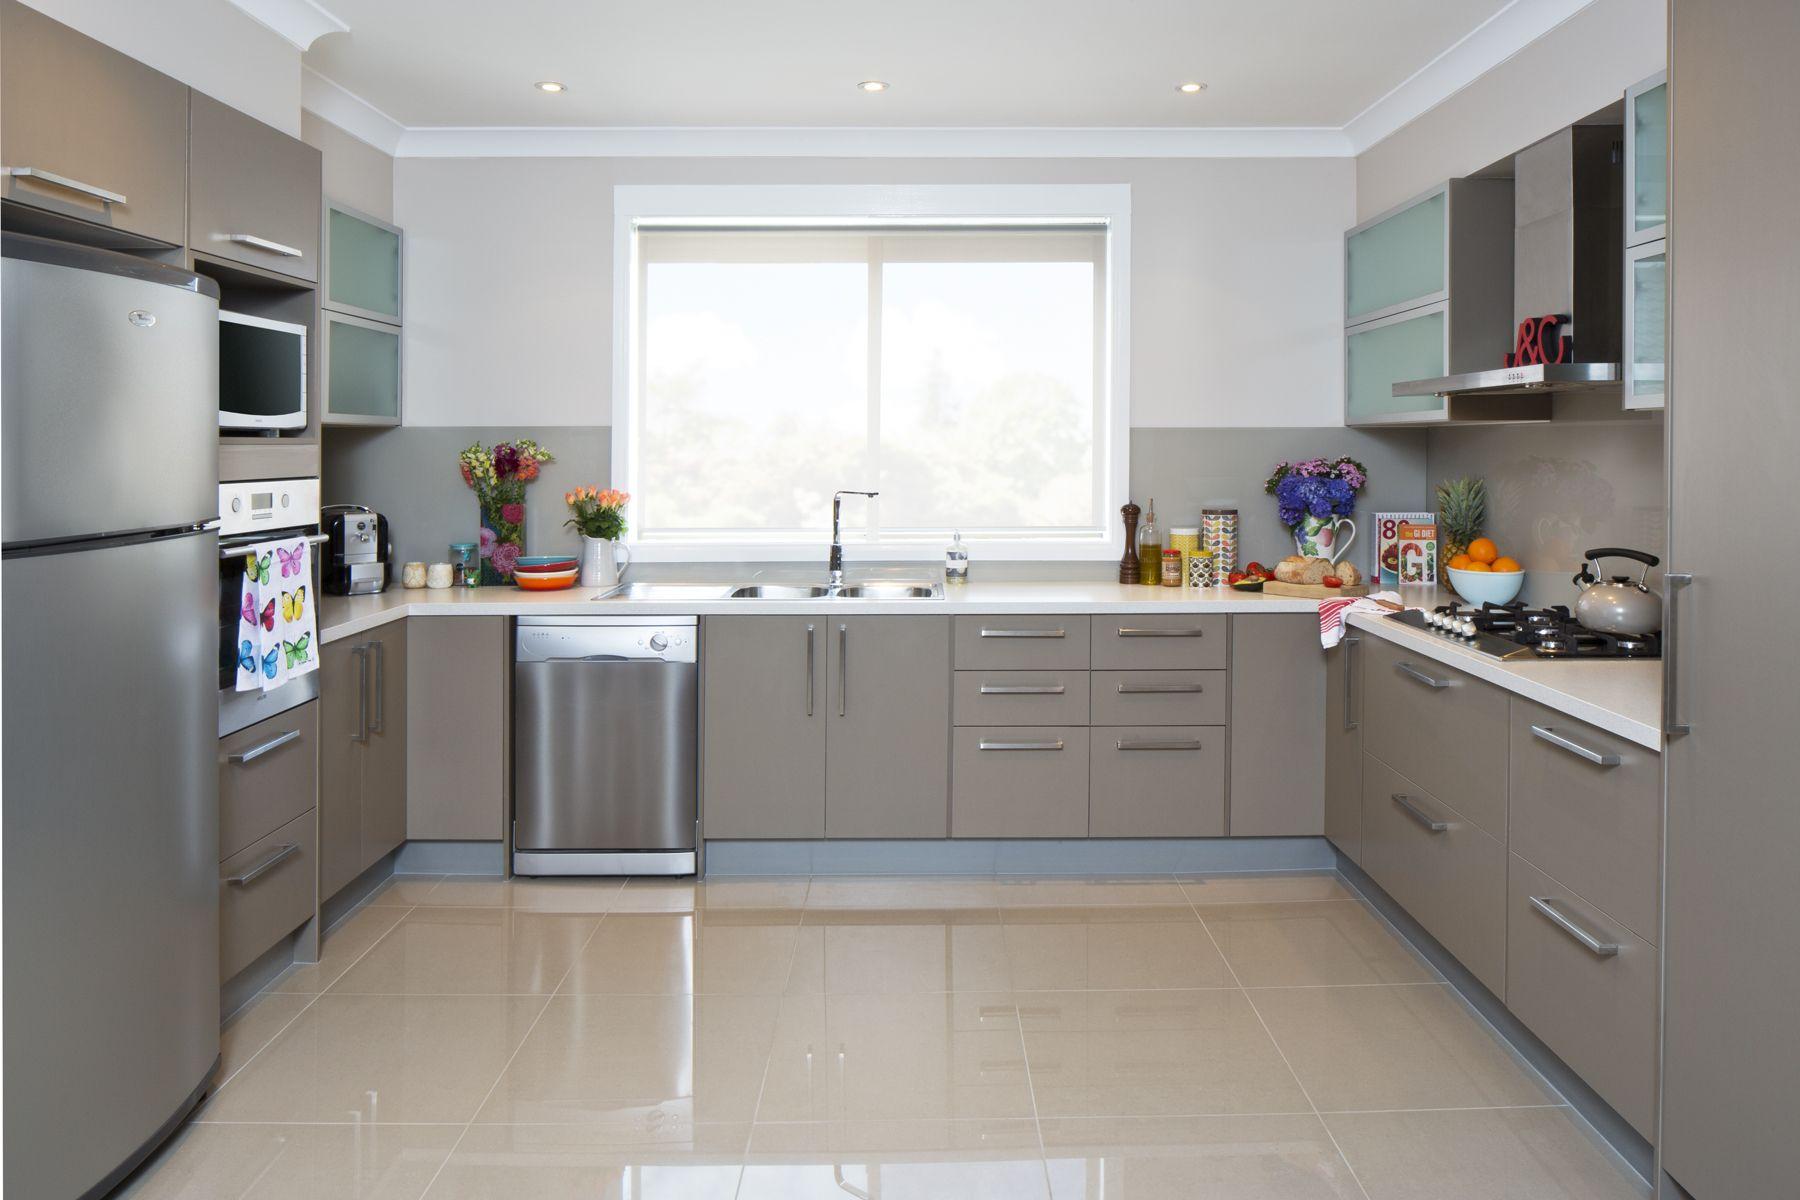 kaboodle kitchen kitchen renovation trends diy kitchen kitchen design on kaboodle kitchen design id=30687